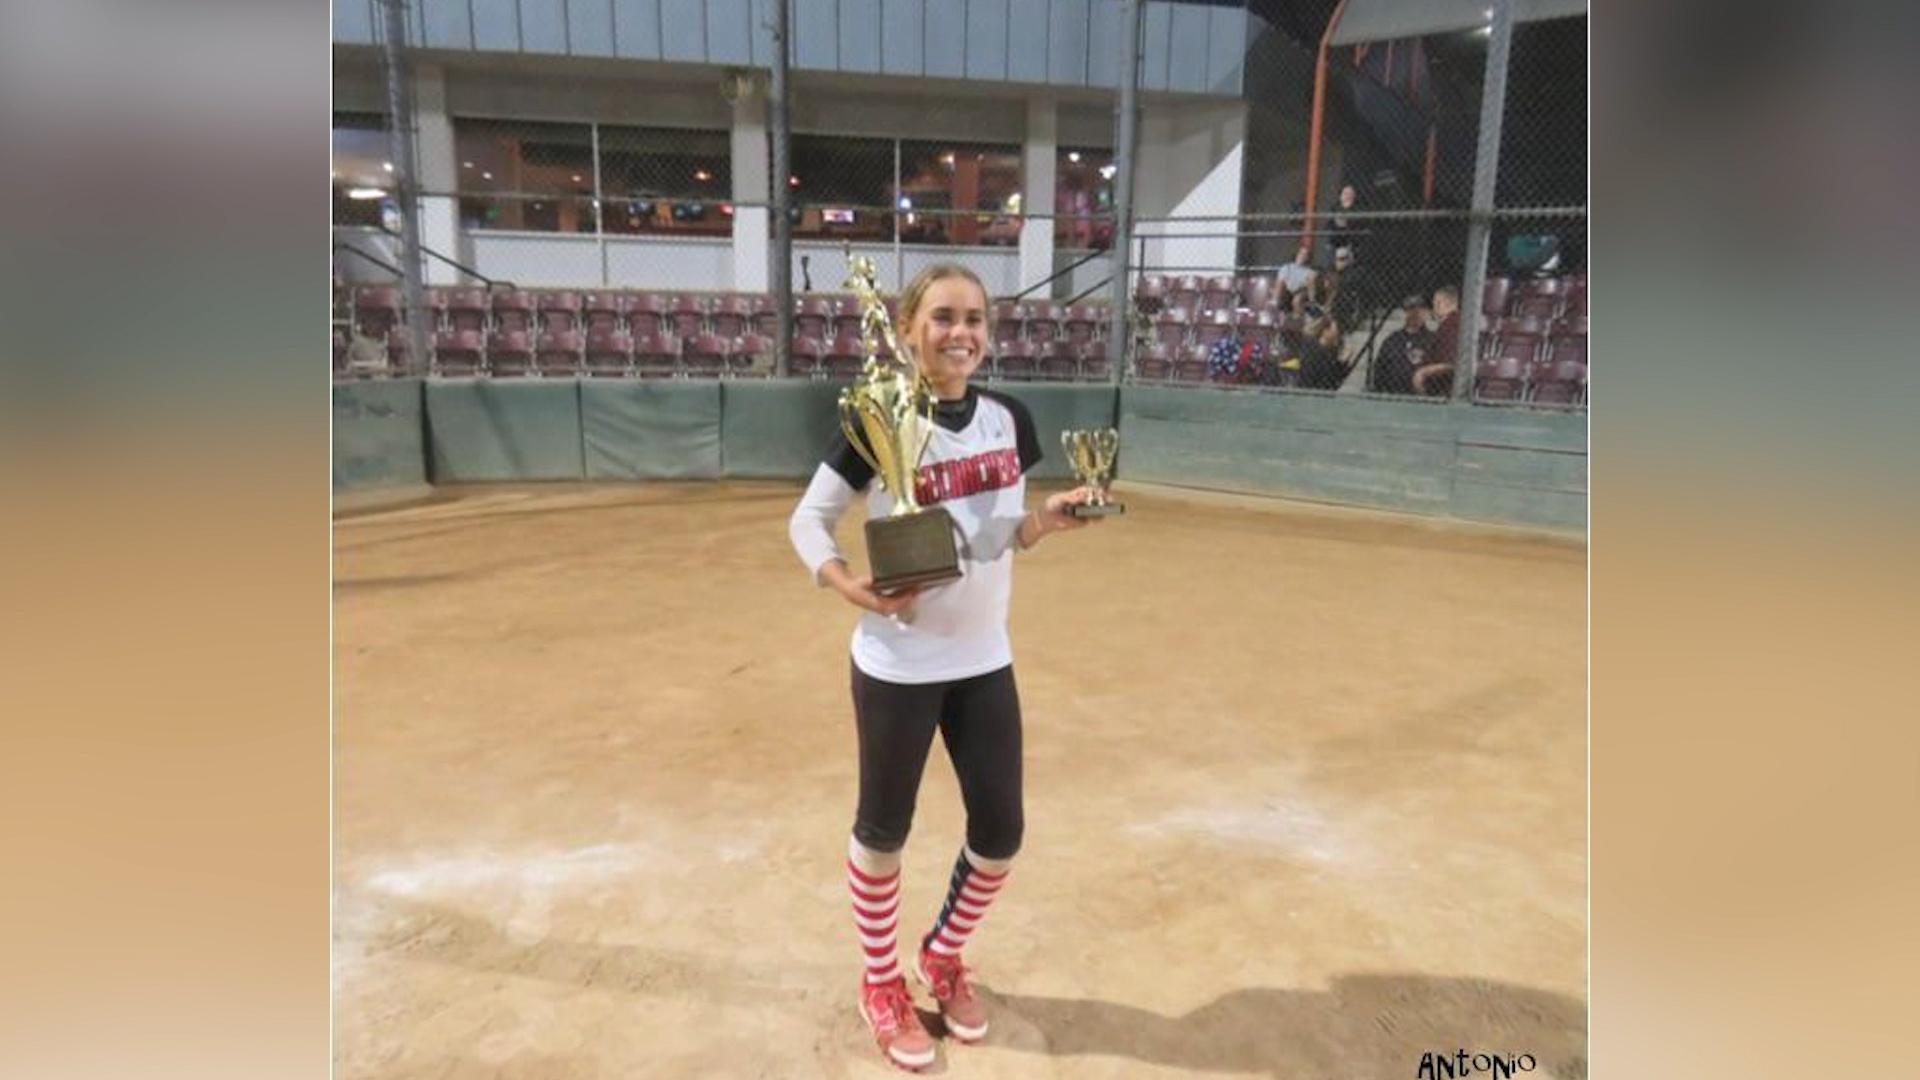 H.S. Softball Star Taryn Clements